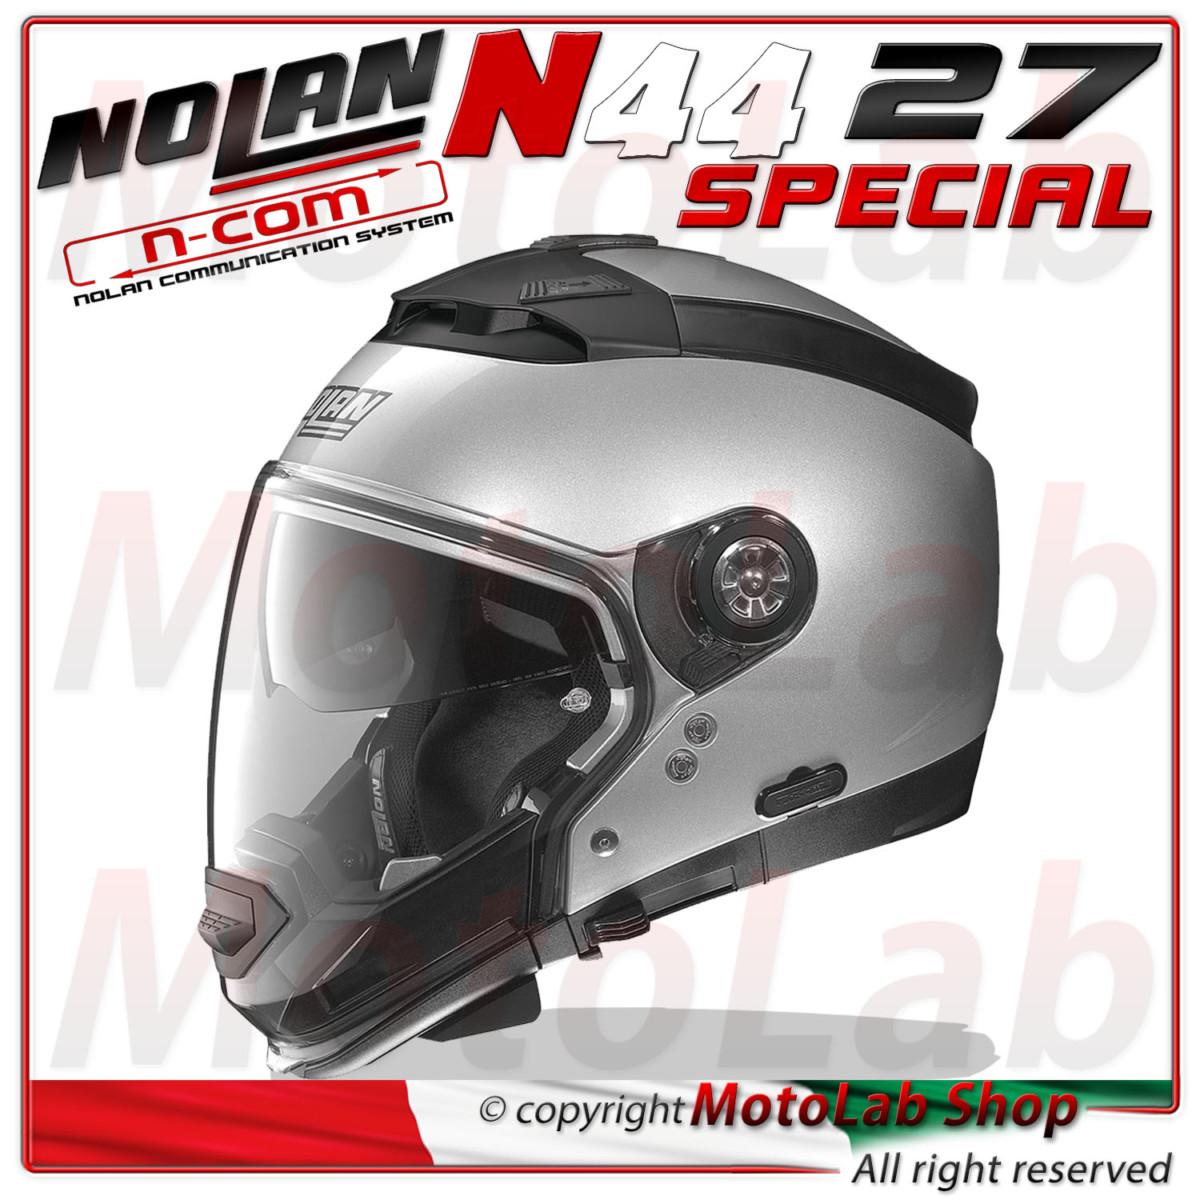 Casque Modulare Nolan N44 Special N COM 27 Salt Silver Argent Taille